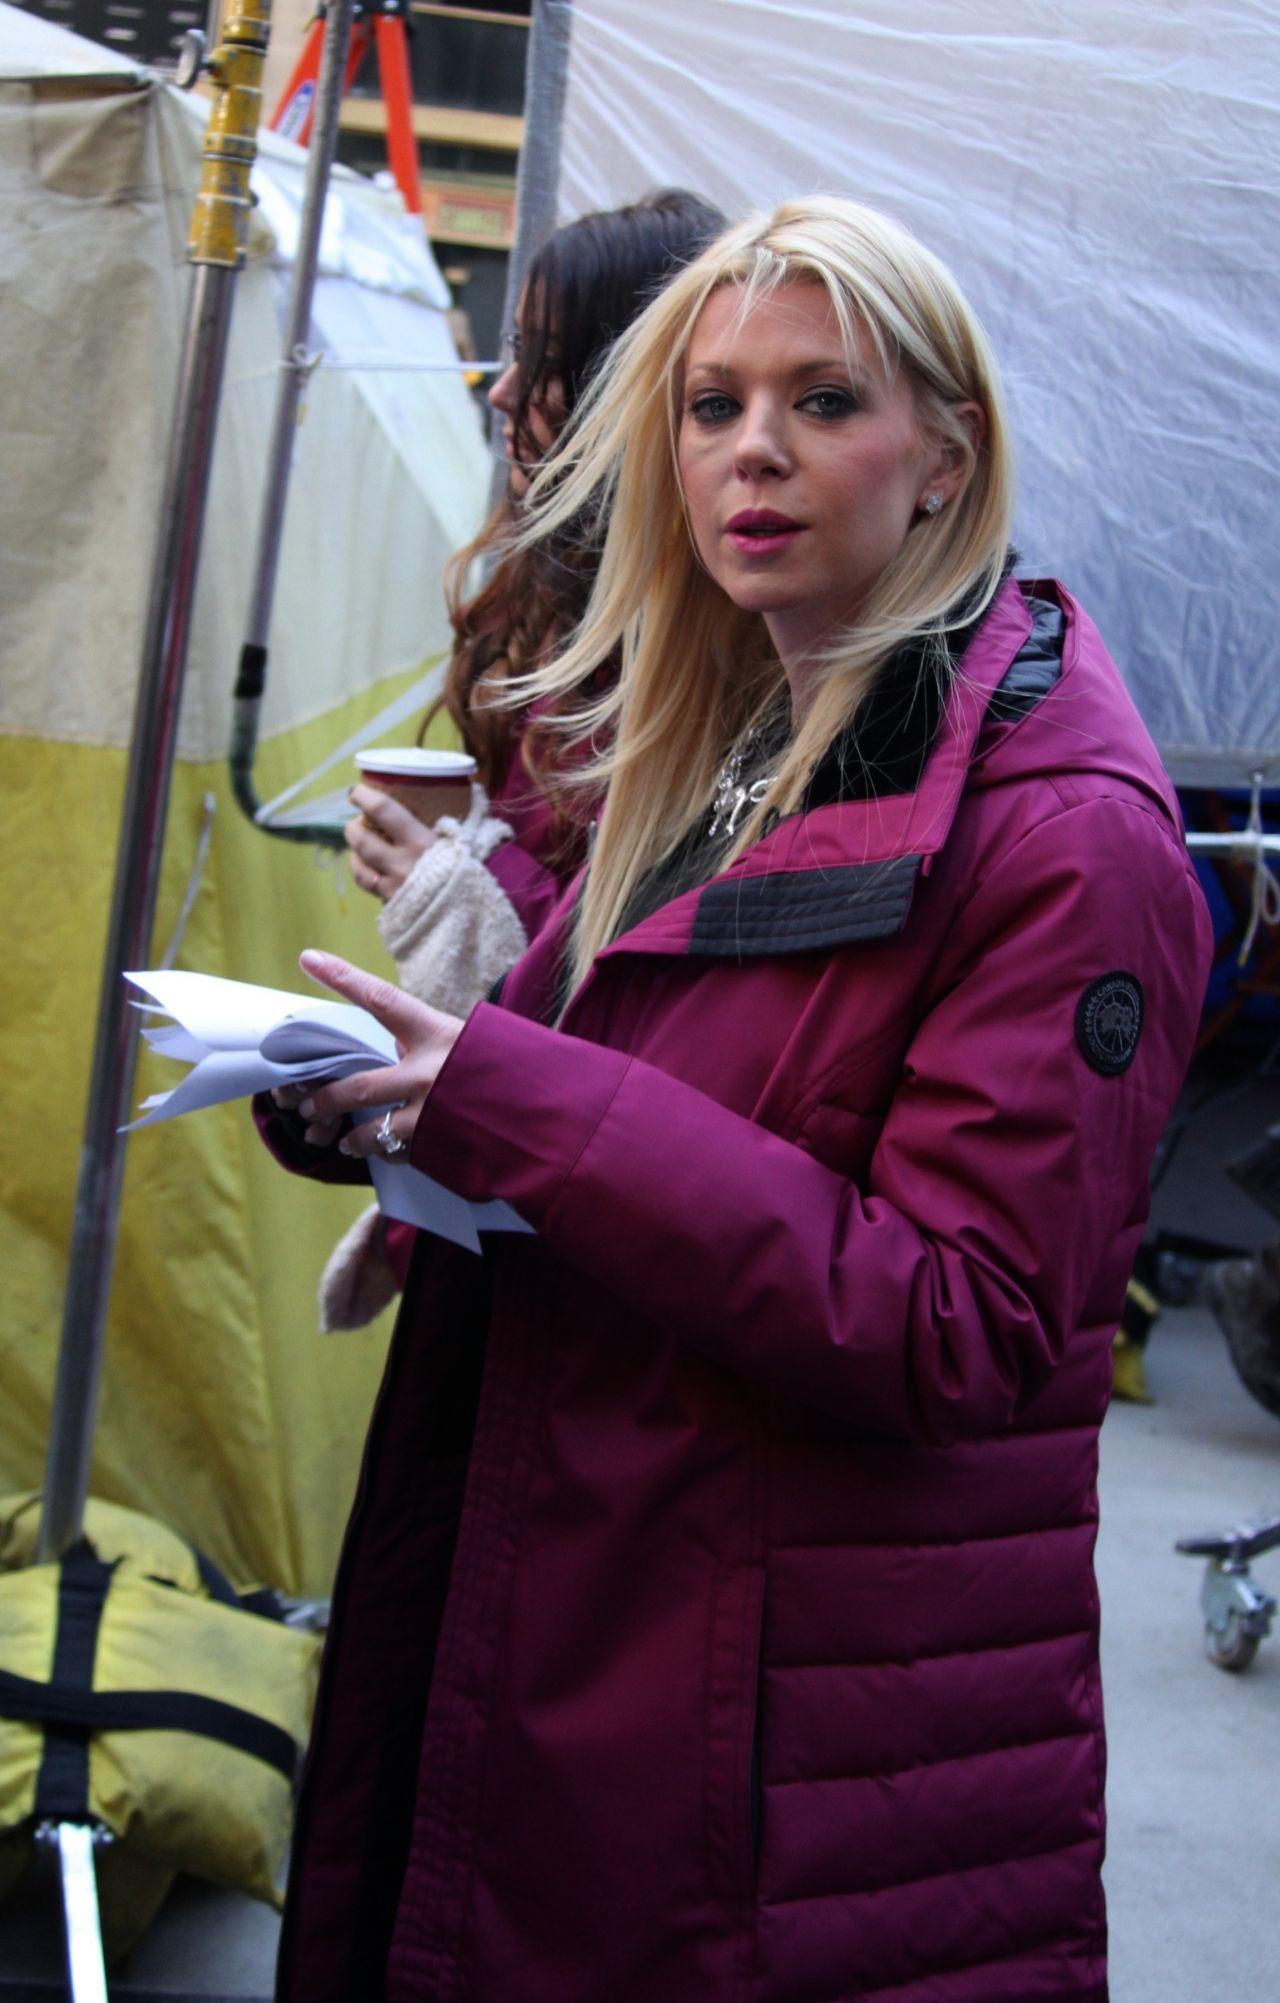 Tara Reid - 'Sharknado 2' Movie Set Photos - Manhattan ...